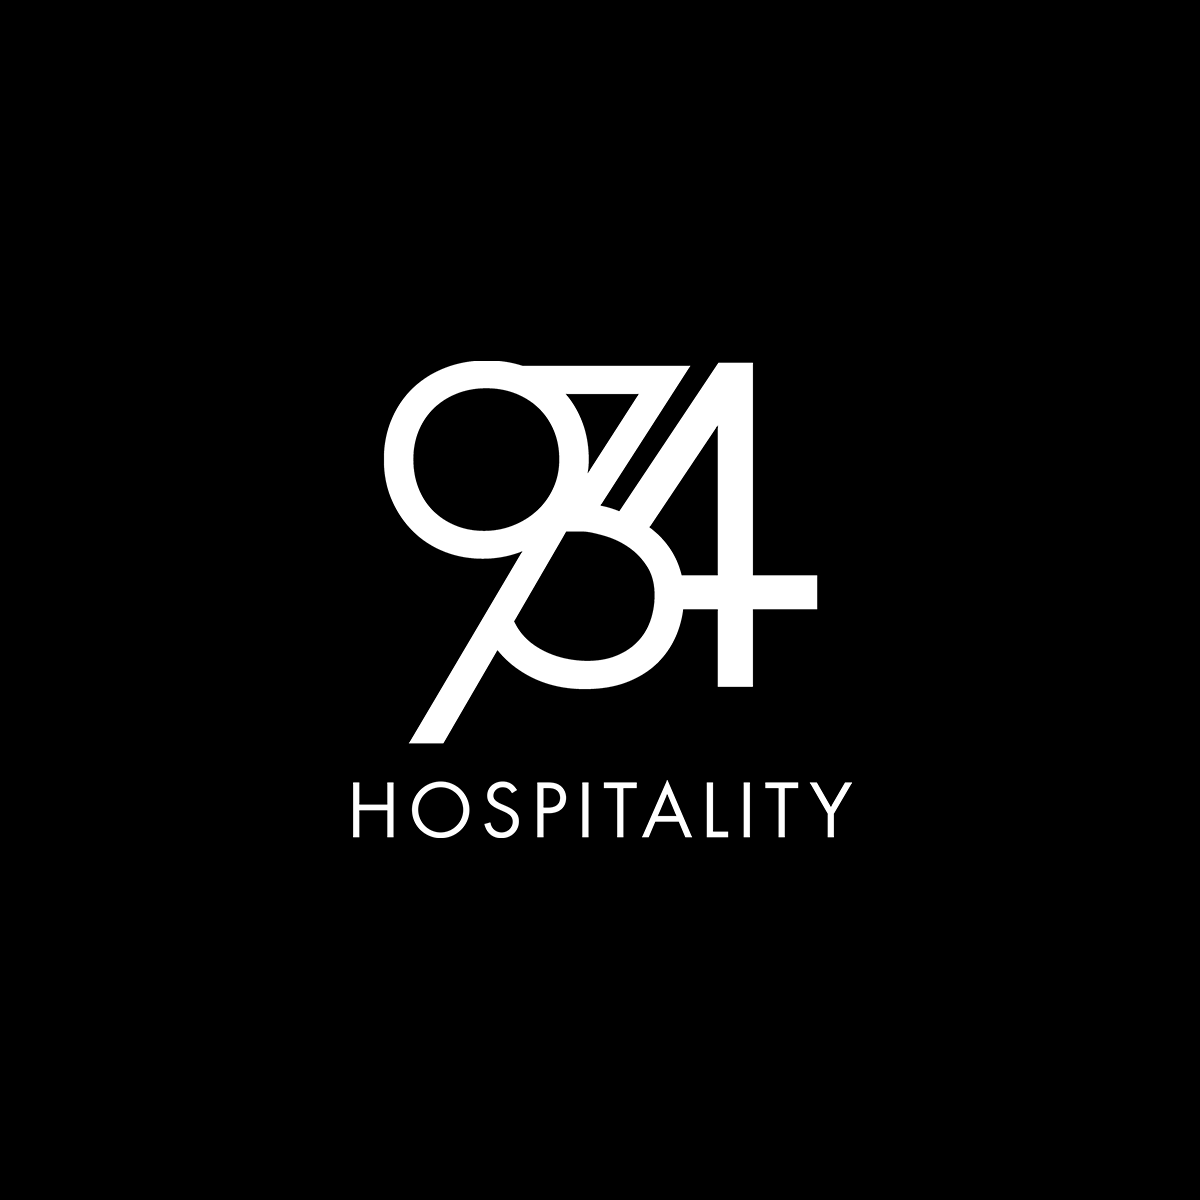 934 Hospitality (Long)